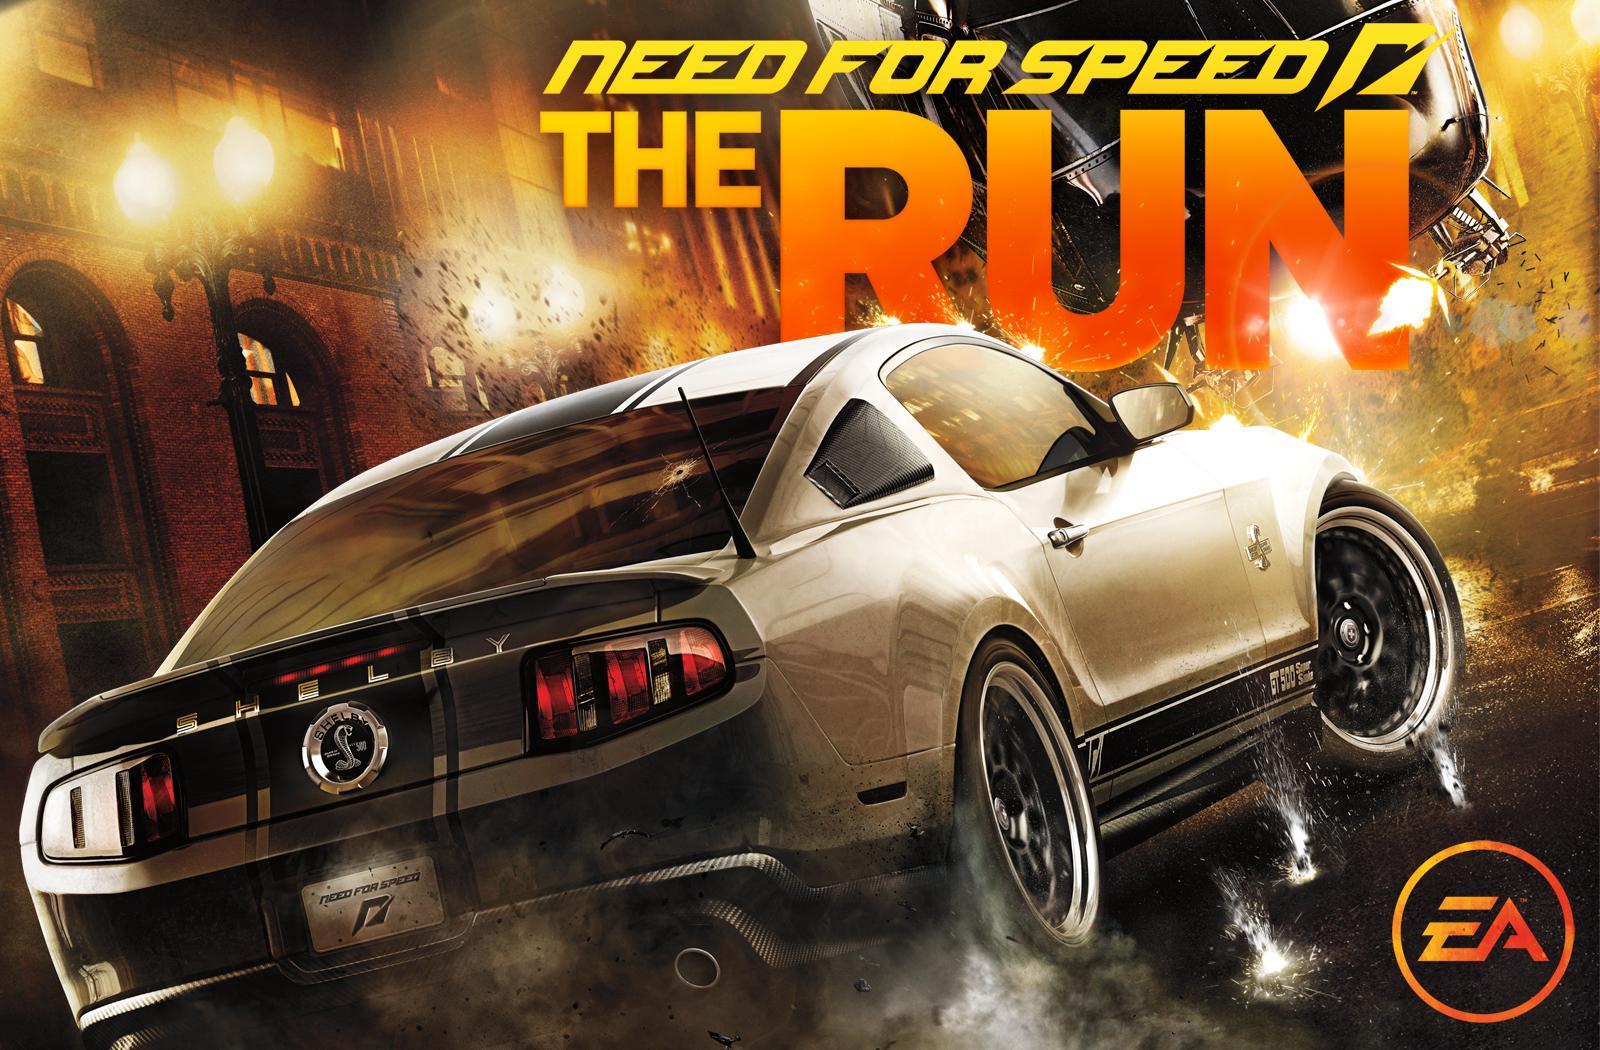 http://3.bp.blogspot.com/-7QeTHwD1YUw/UEJmSI-qzLI/AAAAAAAAGWI/Hs4P-om3Fvw/s1600/Need-for-Speed-The-Run-wallpaper.jpg